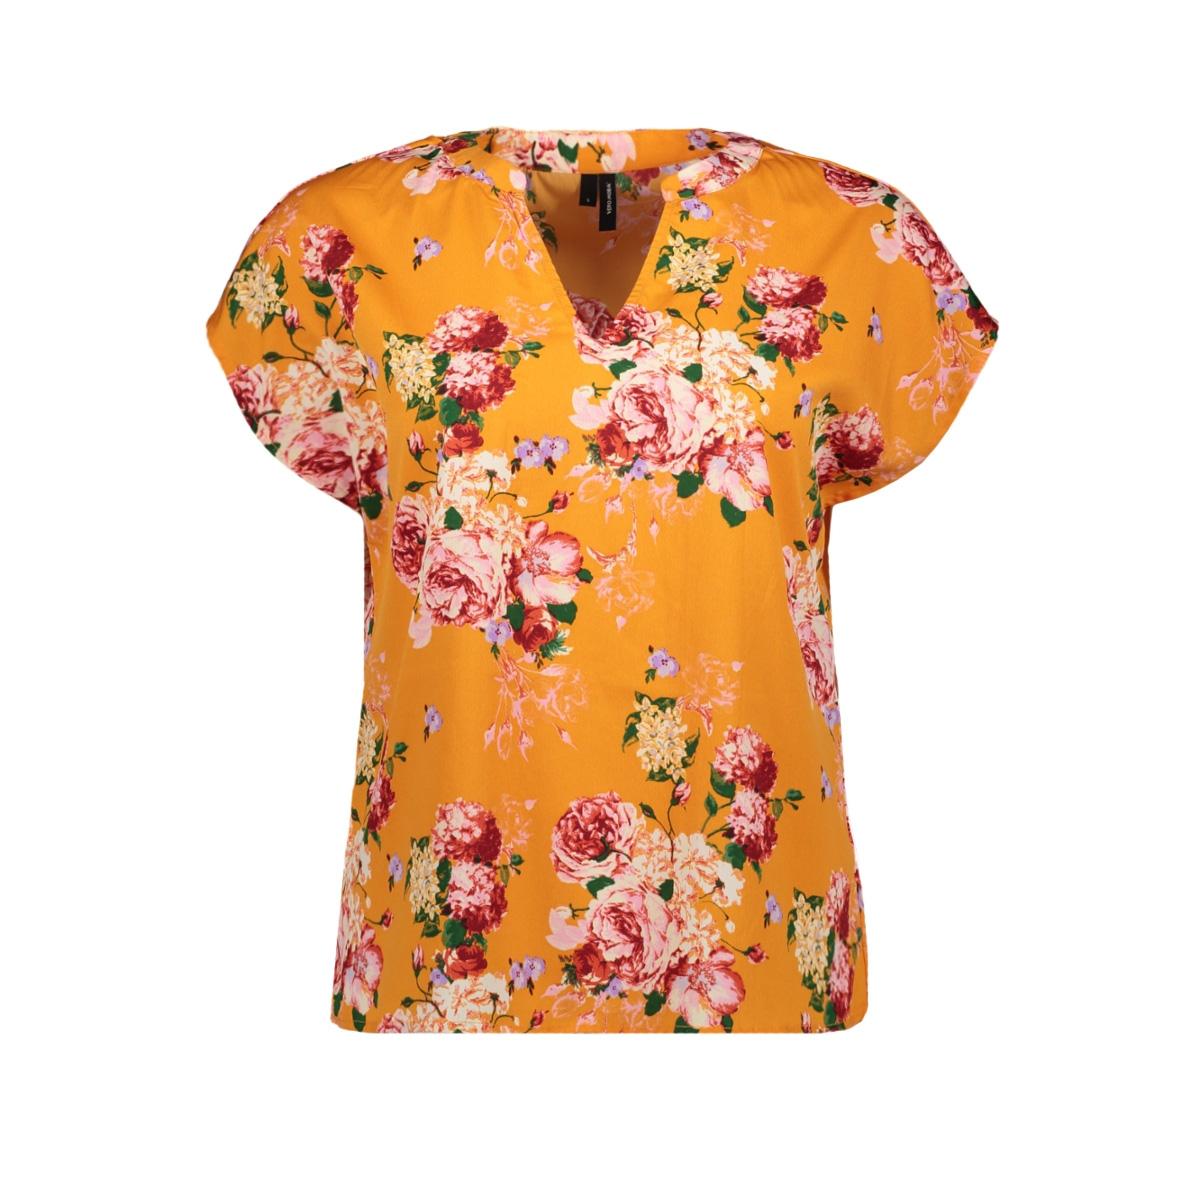 vmane s/s v-neck top exp 10224178 vero moda t-shirt sun orange/ane